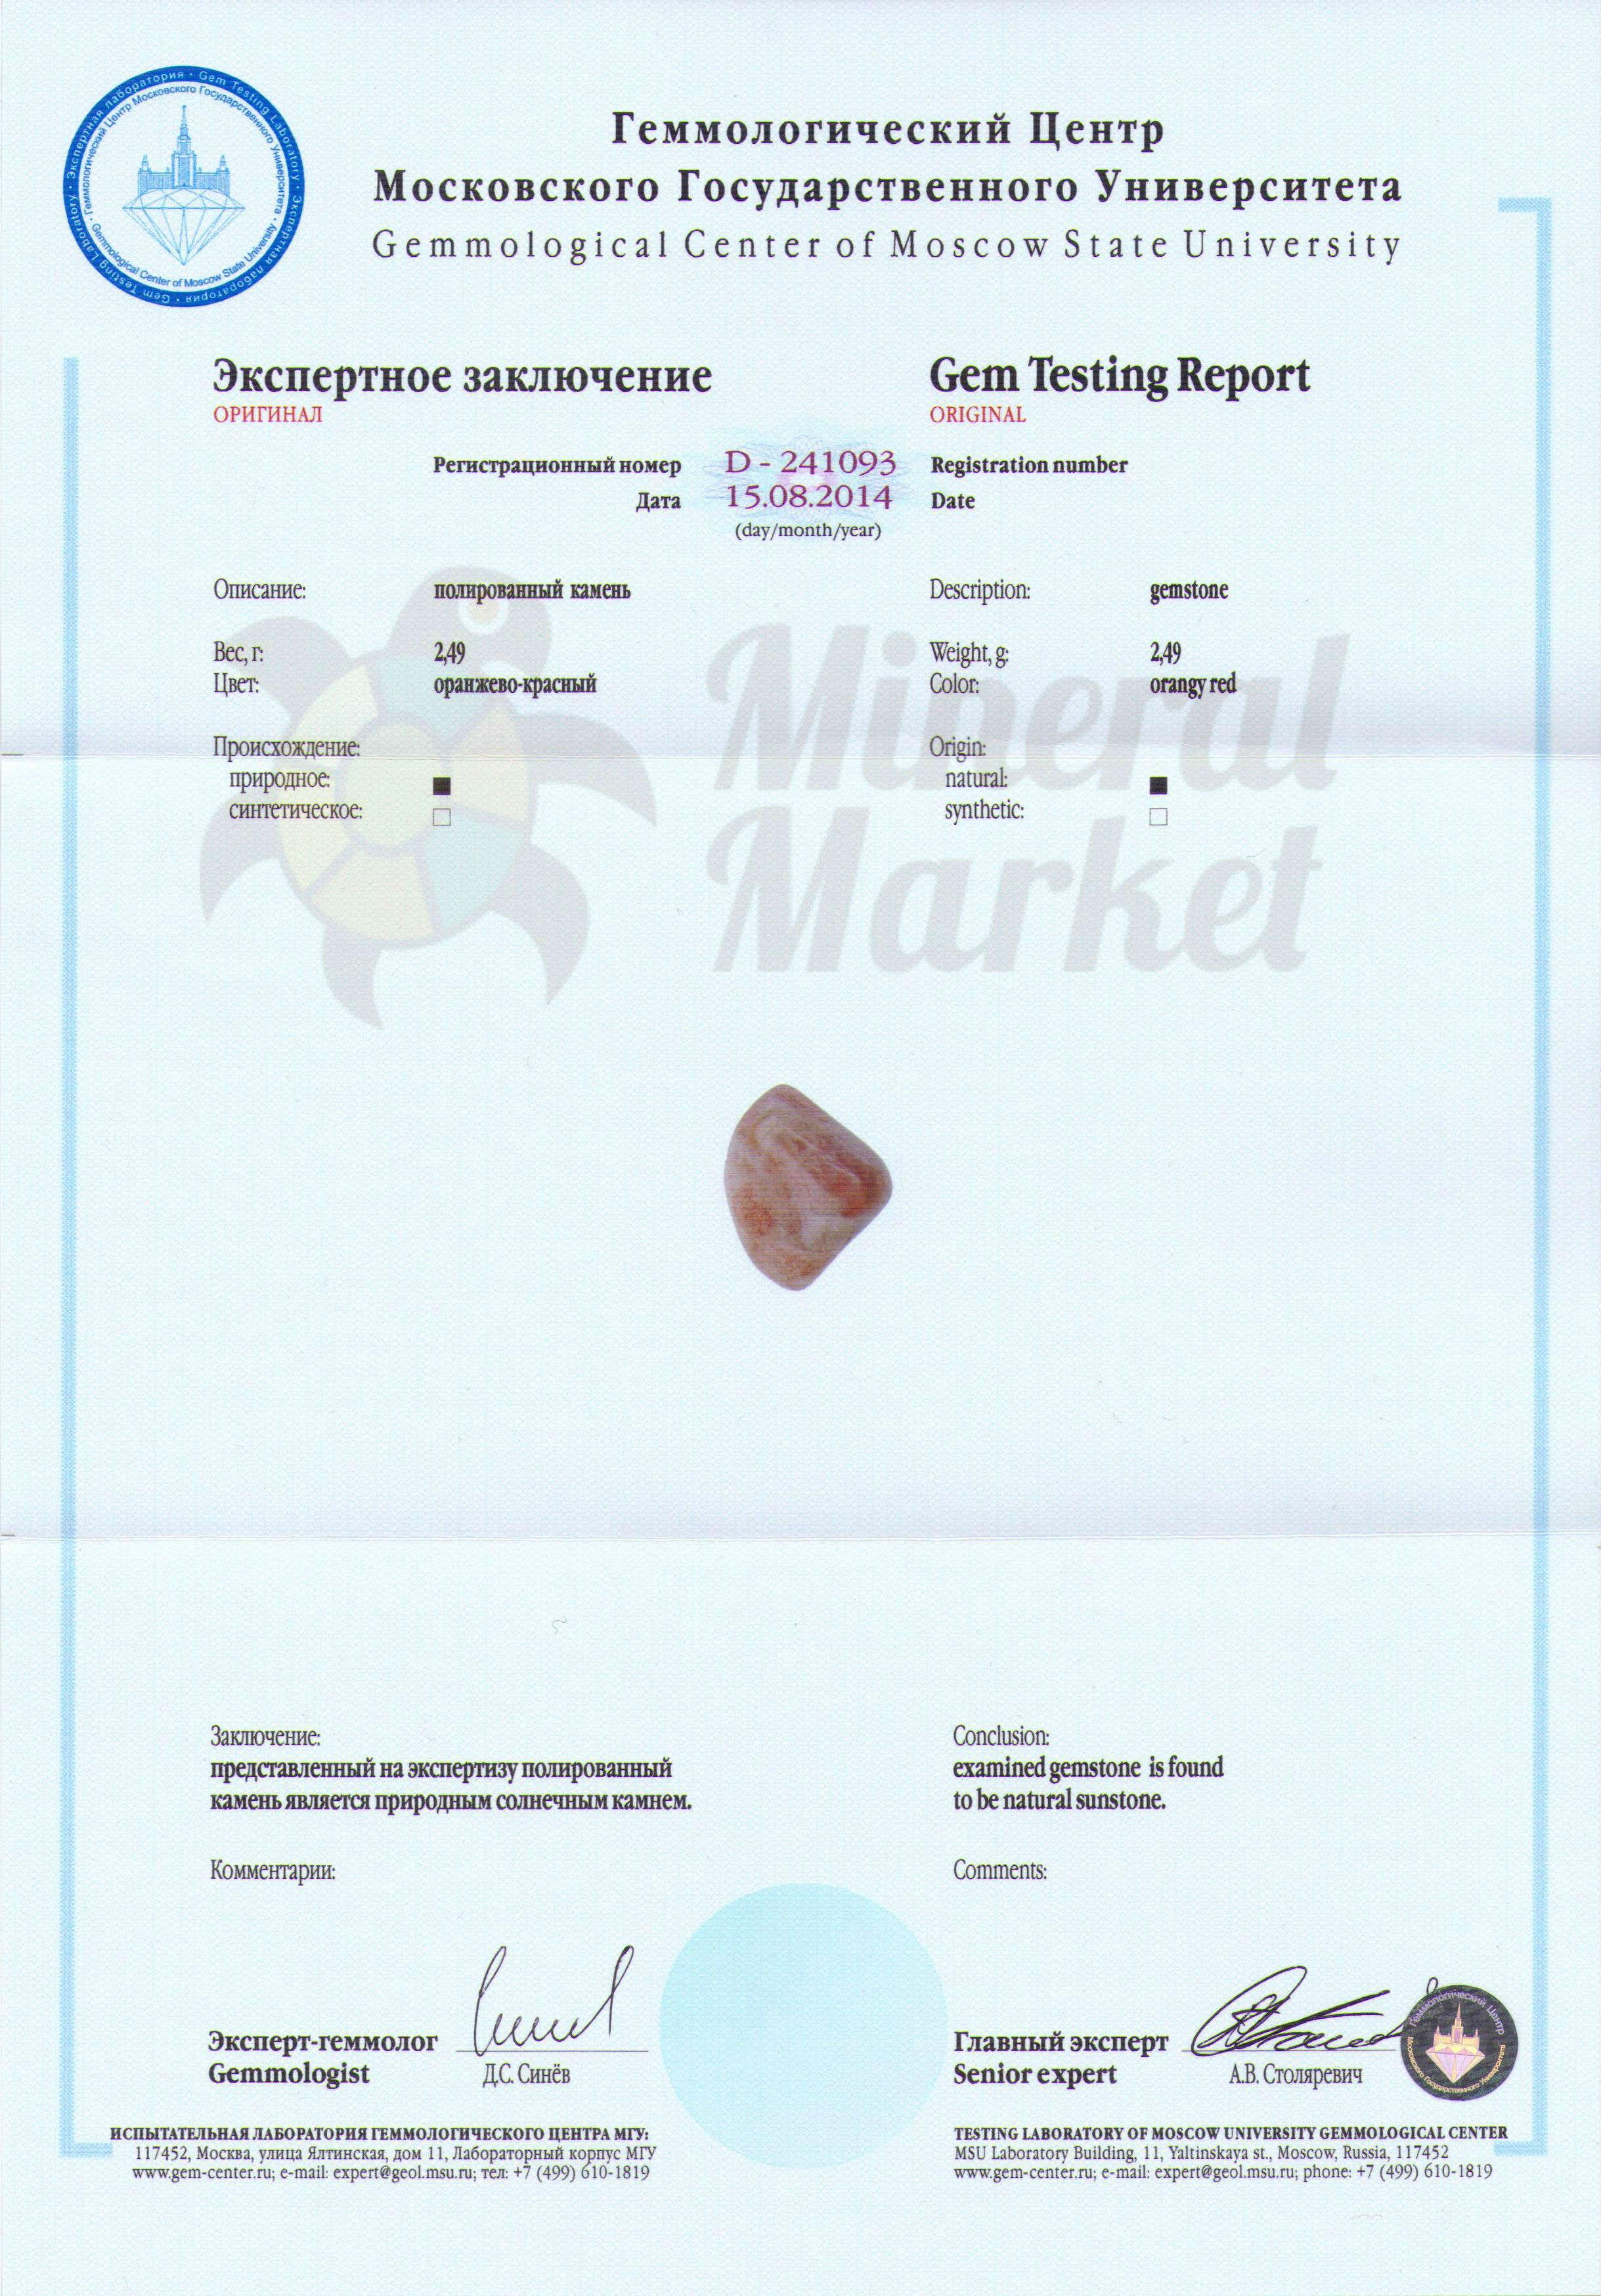 https://mineralmarket.ru/img/certificate/111/111.jpg